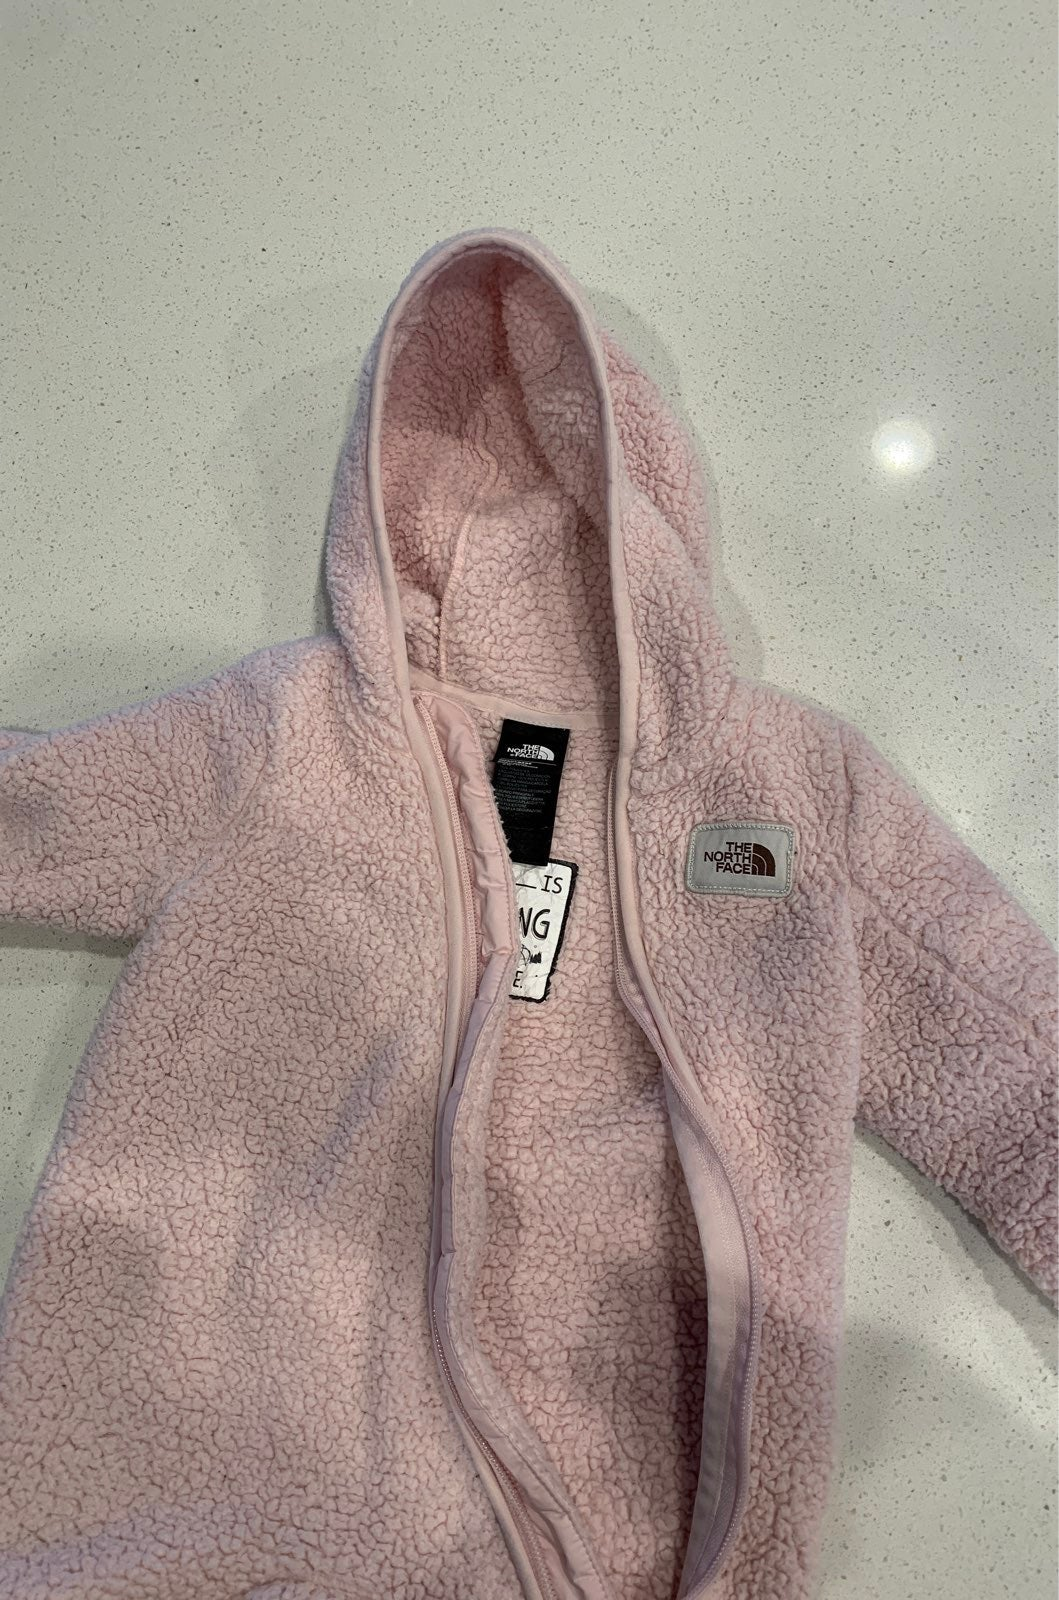 Baby northface suit